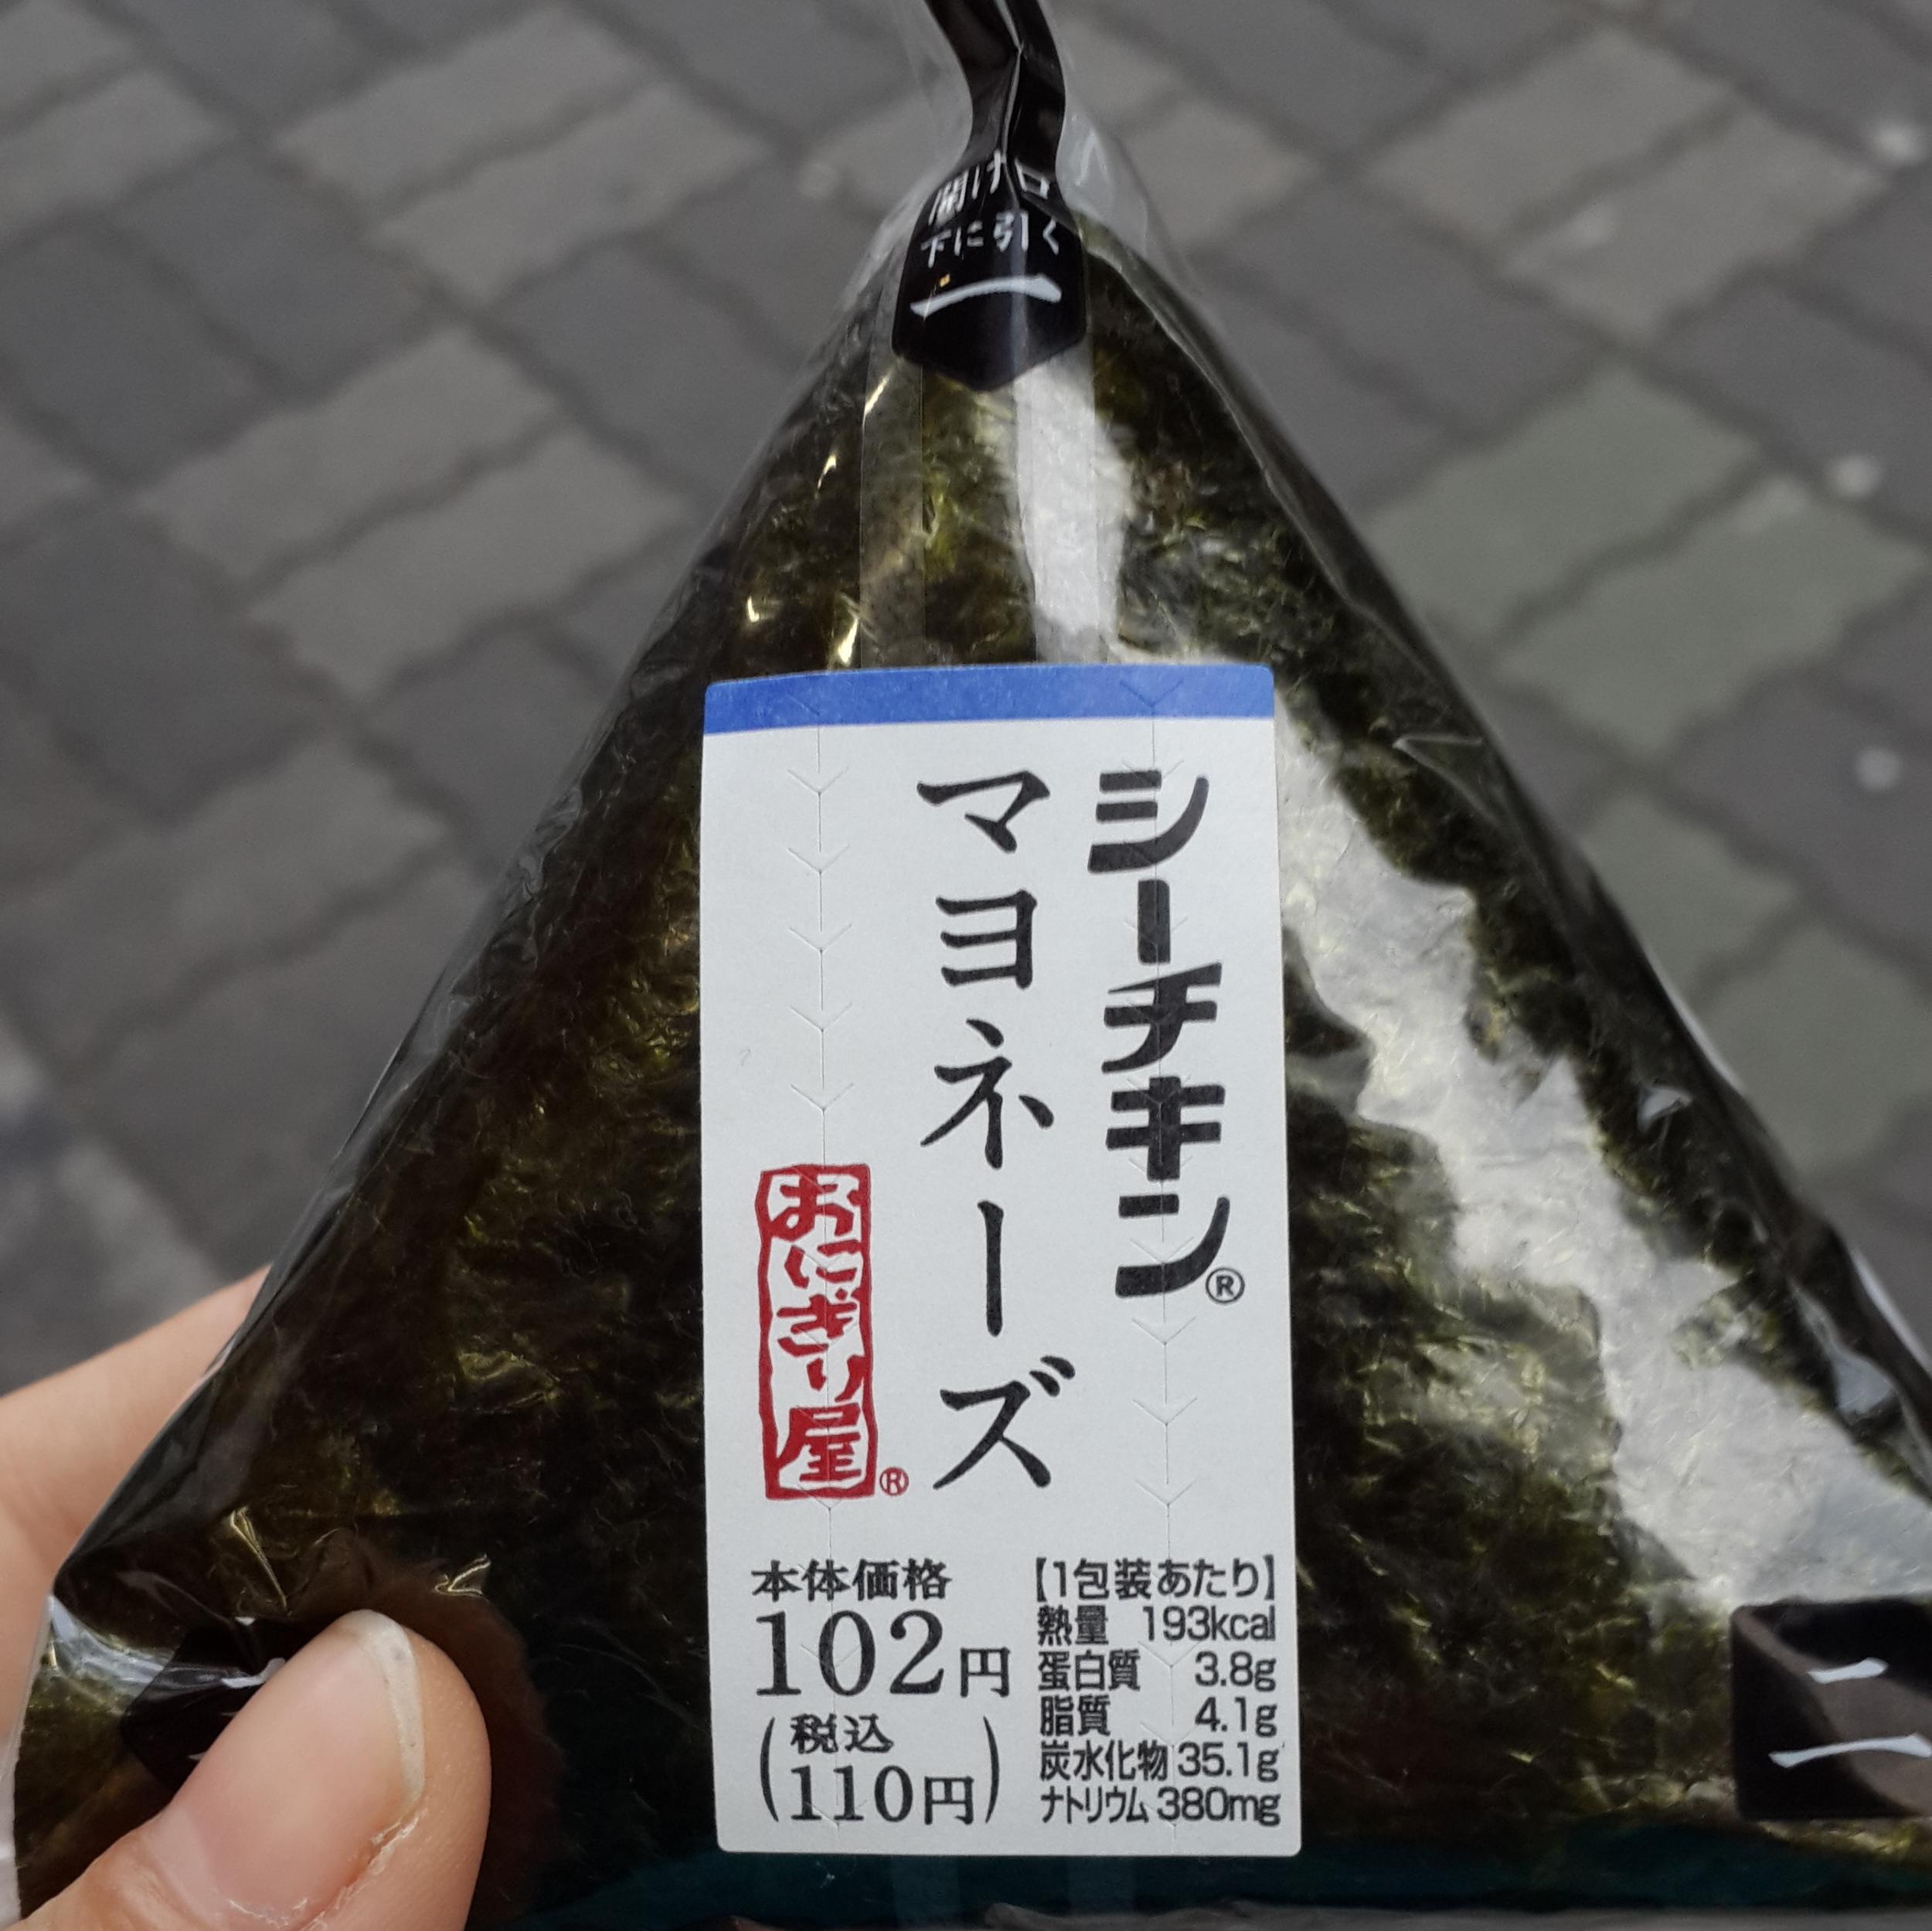 Onigiri - strangely addictive healthy snack